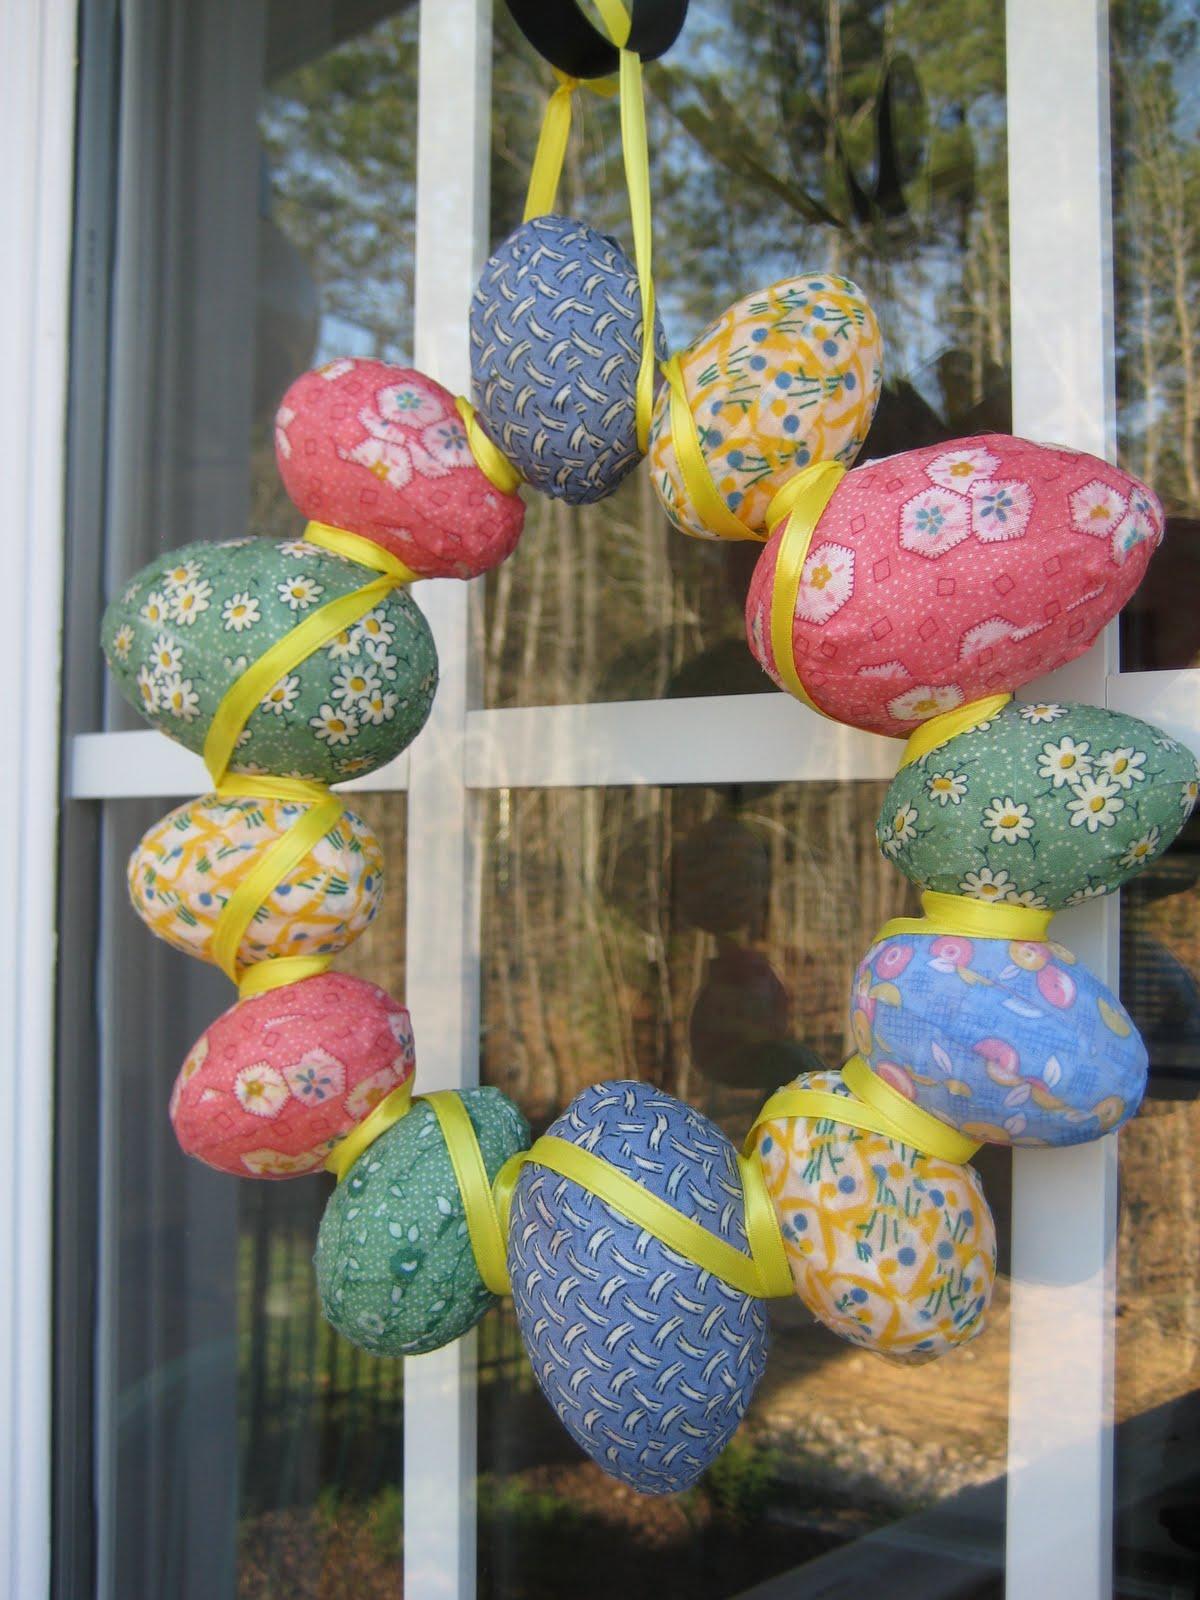 8 ideas for decoupage Easter eggs - Mod Podge Rocks